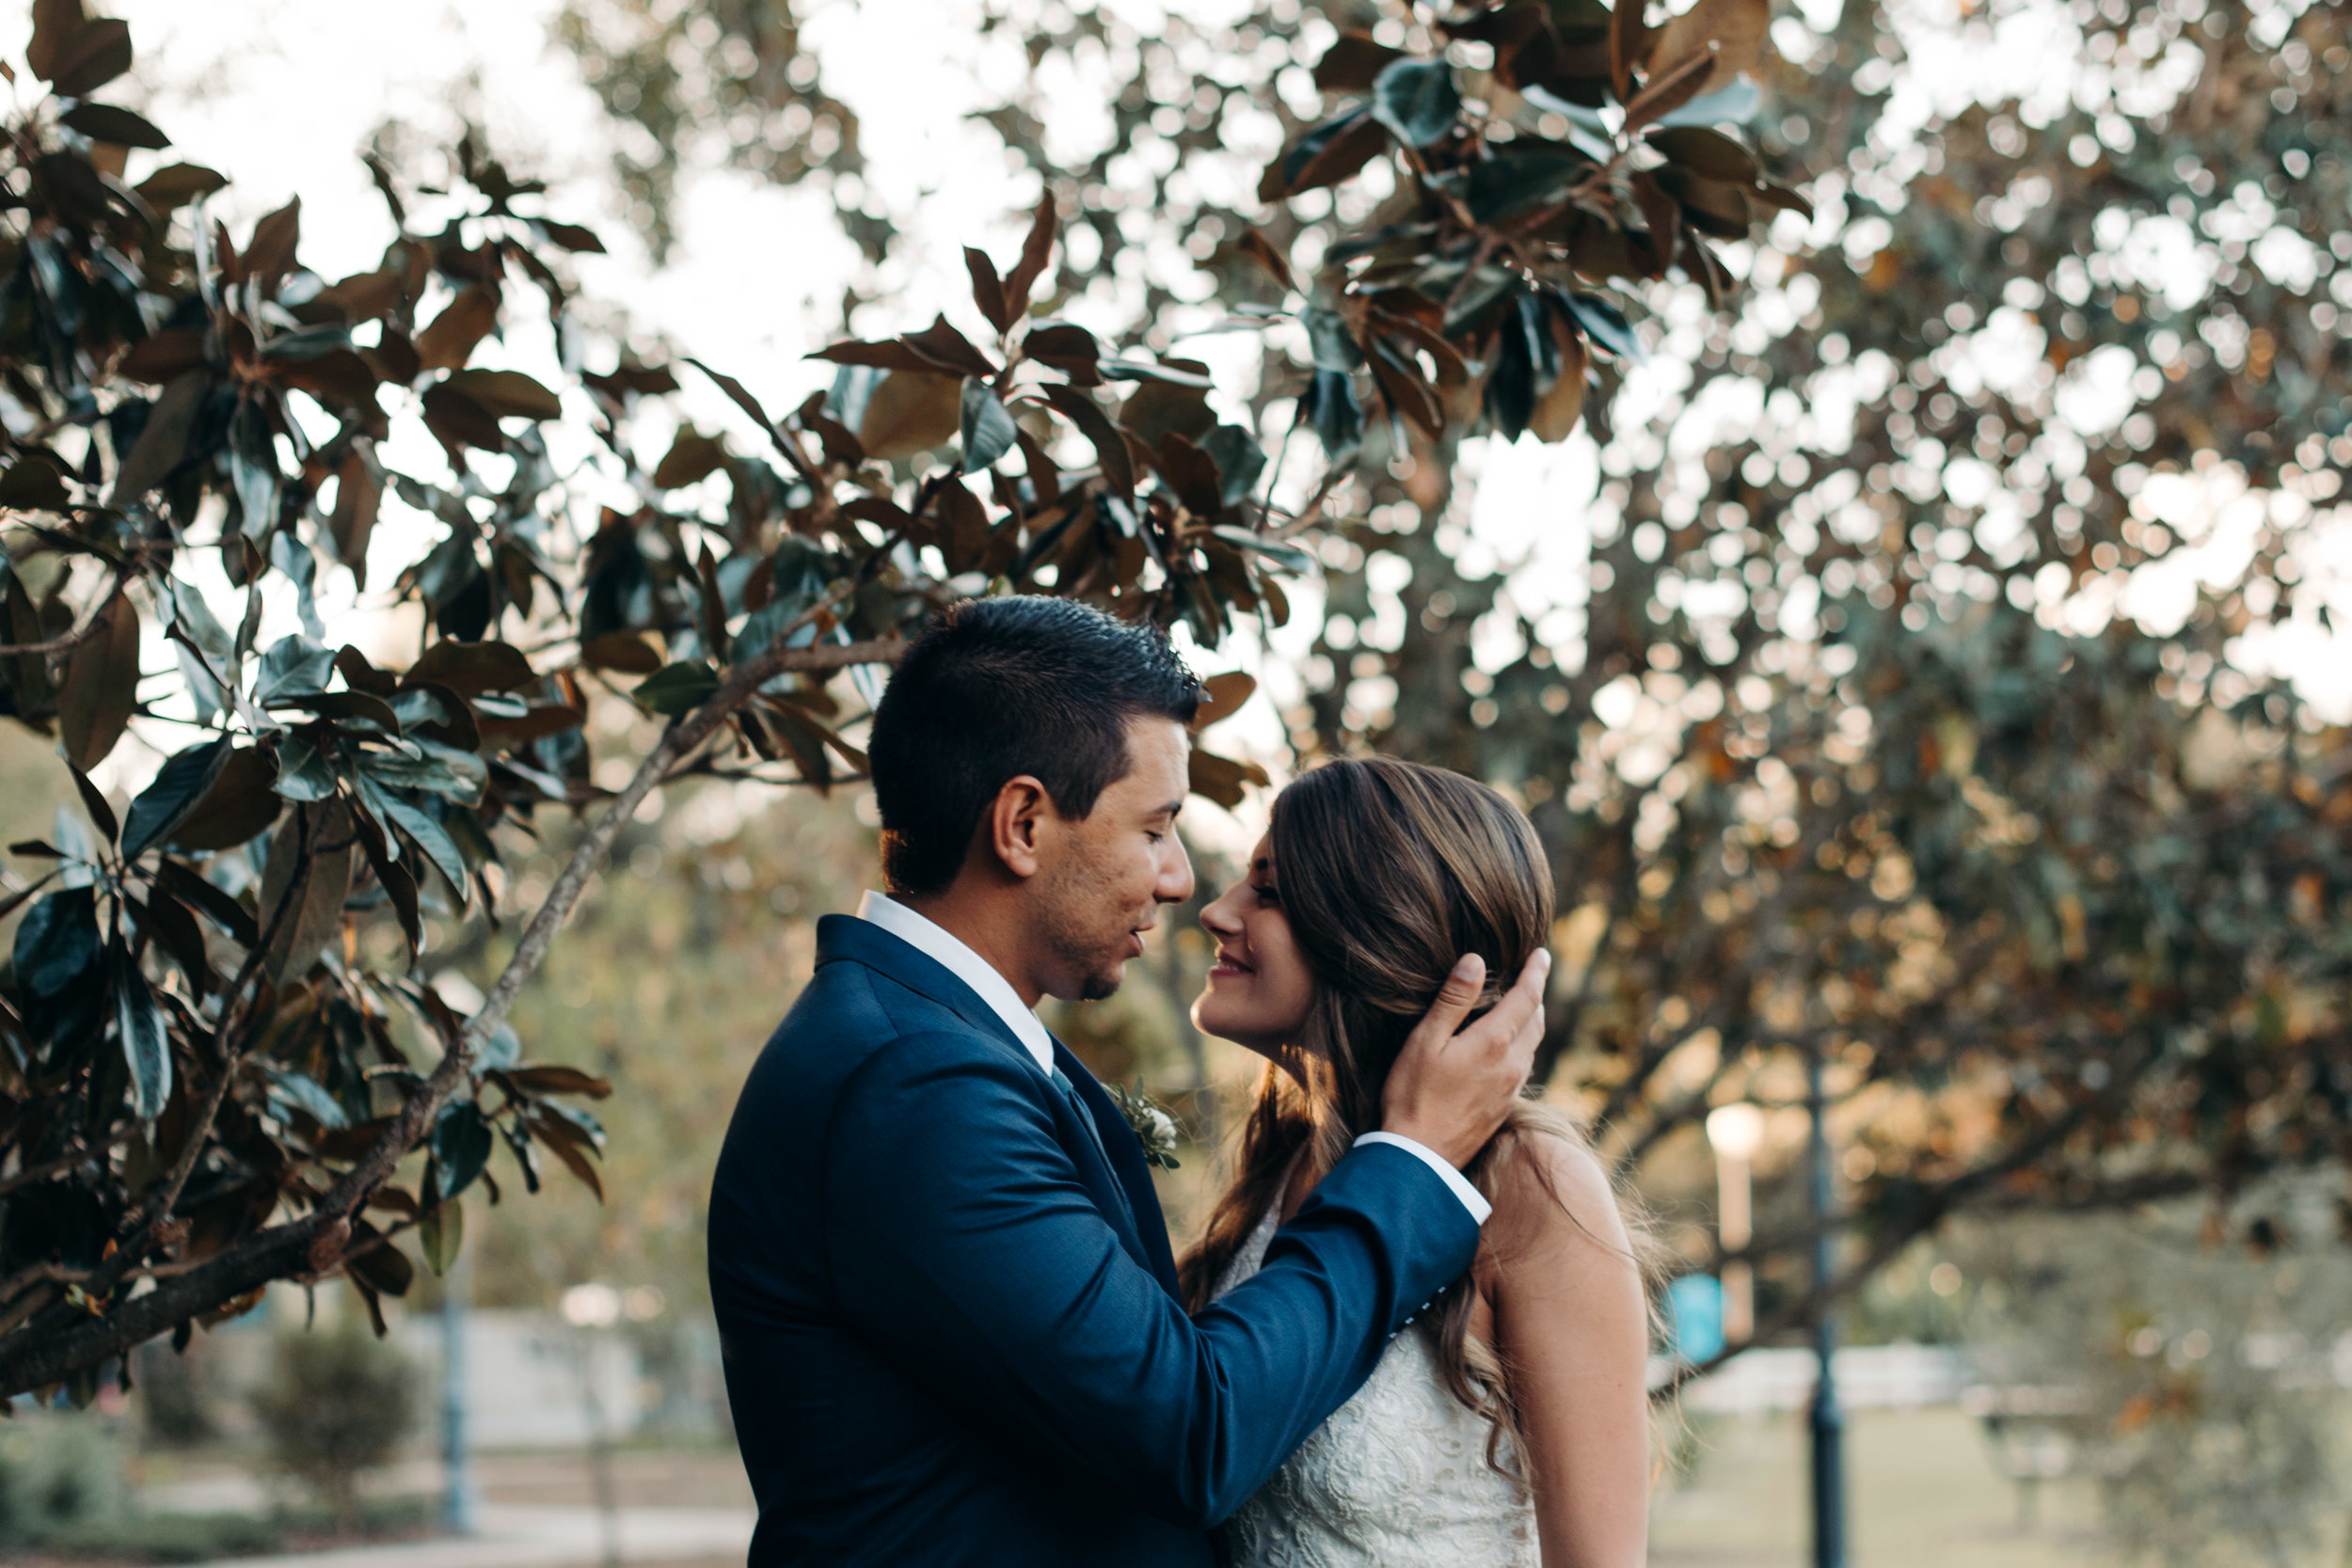 randy-sarah-fontanez-casa-feliz-winter-park-orlando-wedding-photography-276.jpg